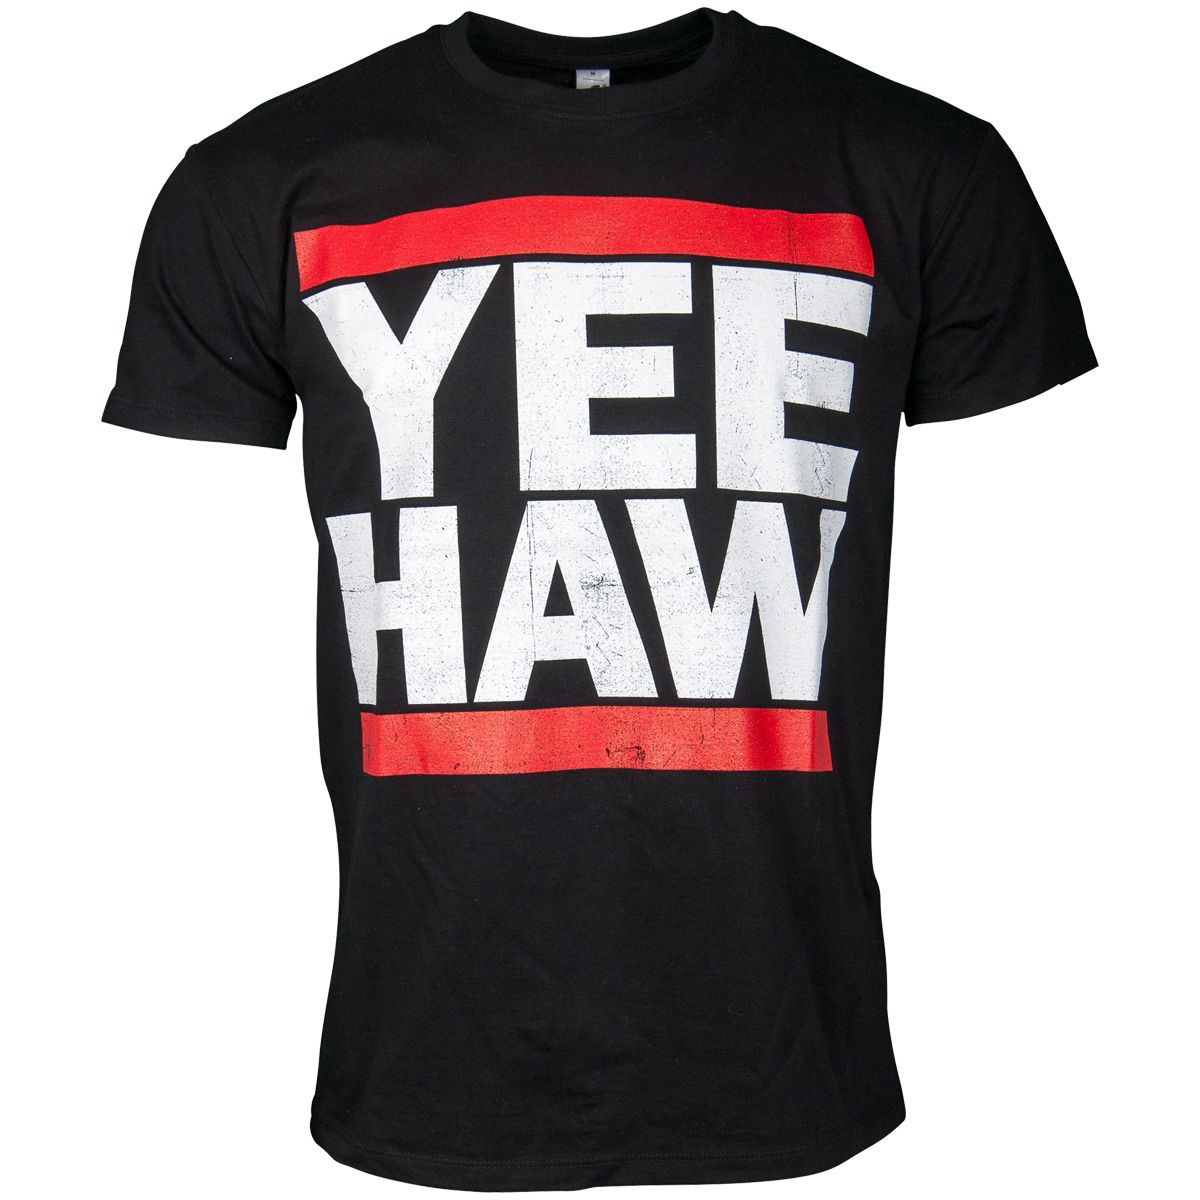 The Bosshoss - T-Shirt Yee Haw - schwarz